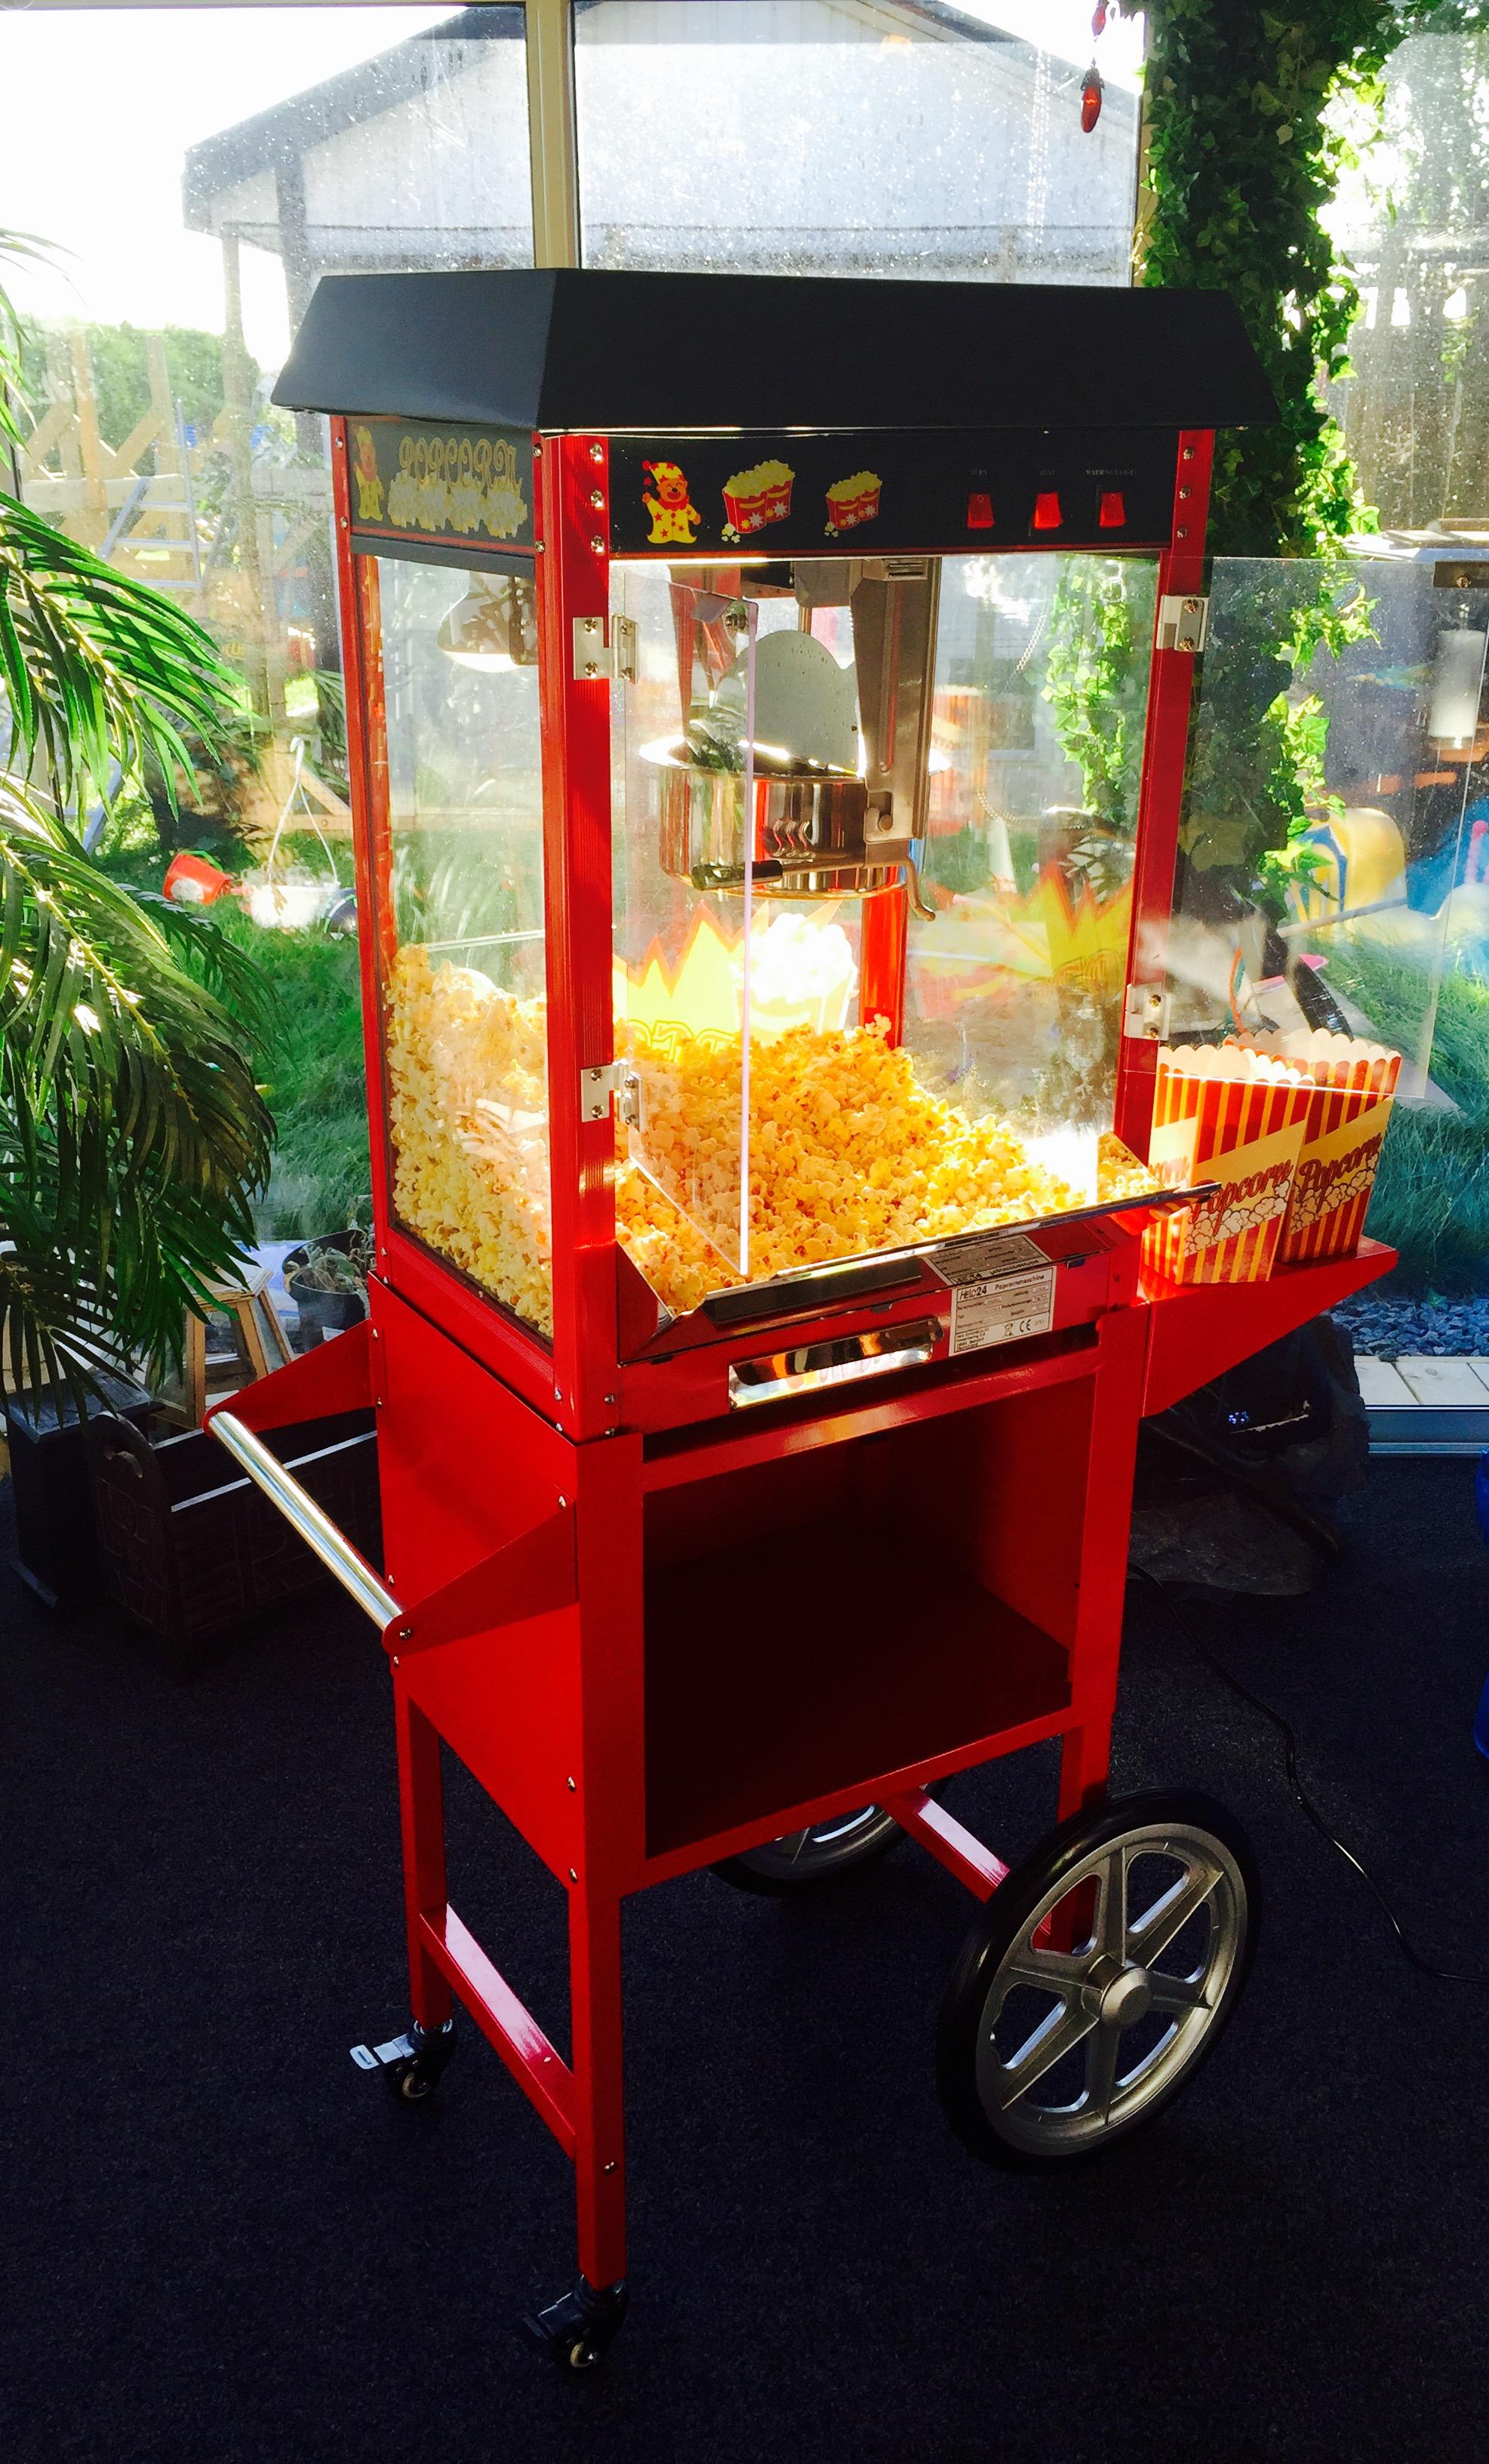 hyra popcornmaskin malmö